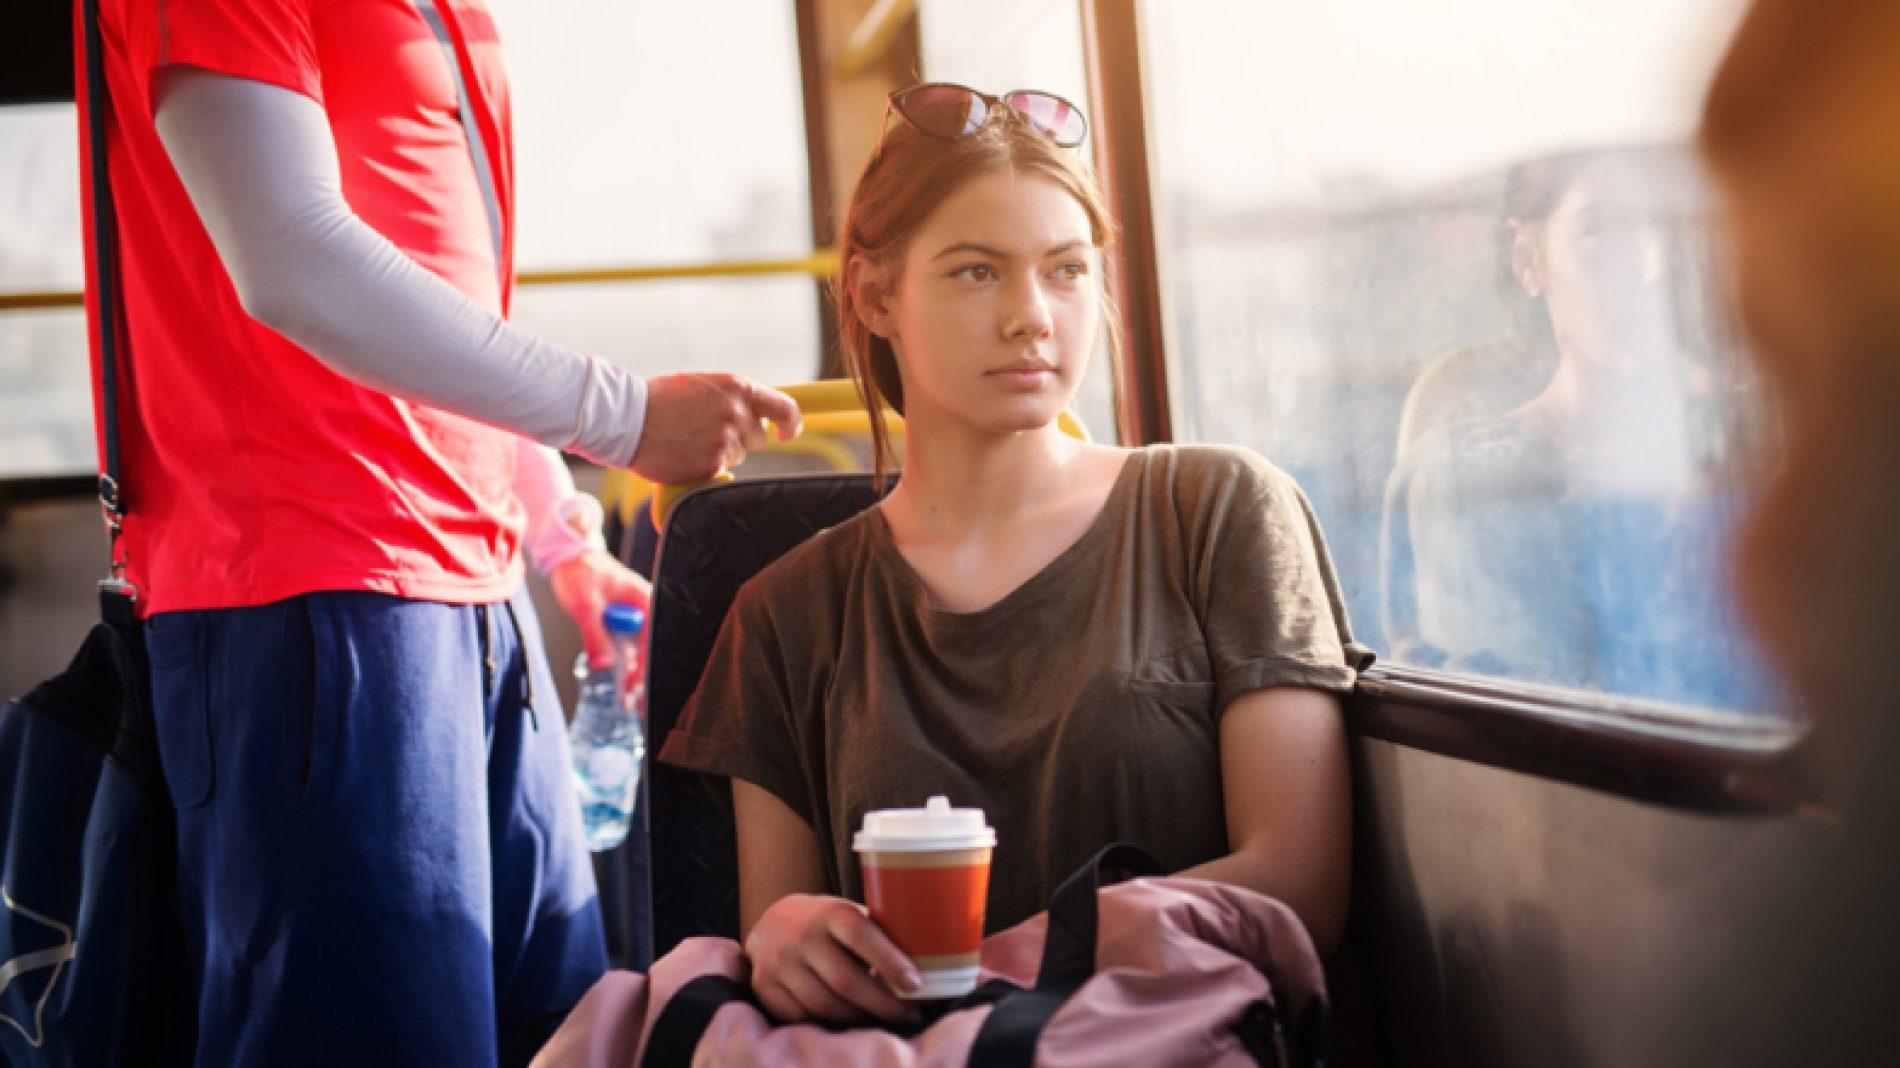 young-woman-commuting-OSENpk